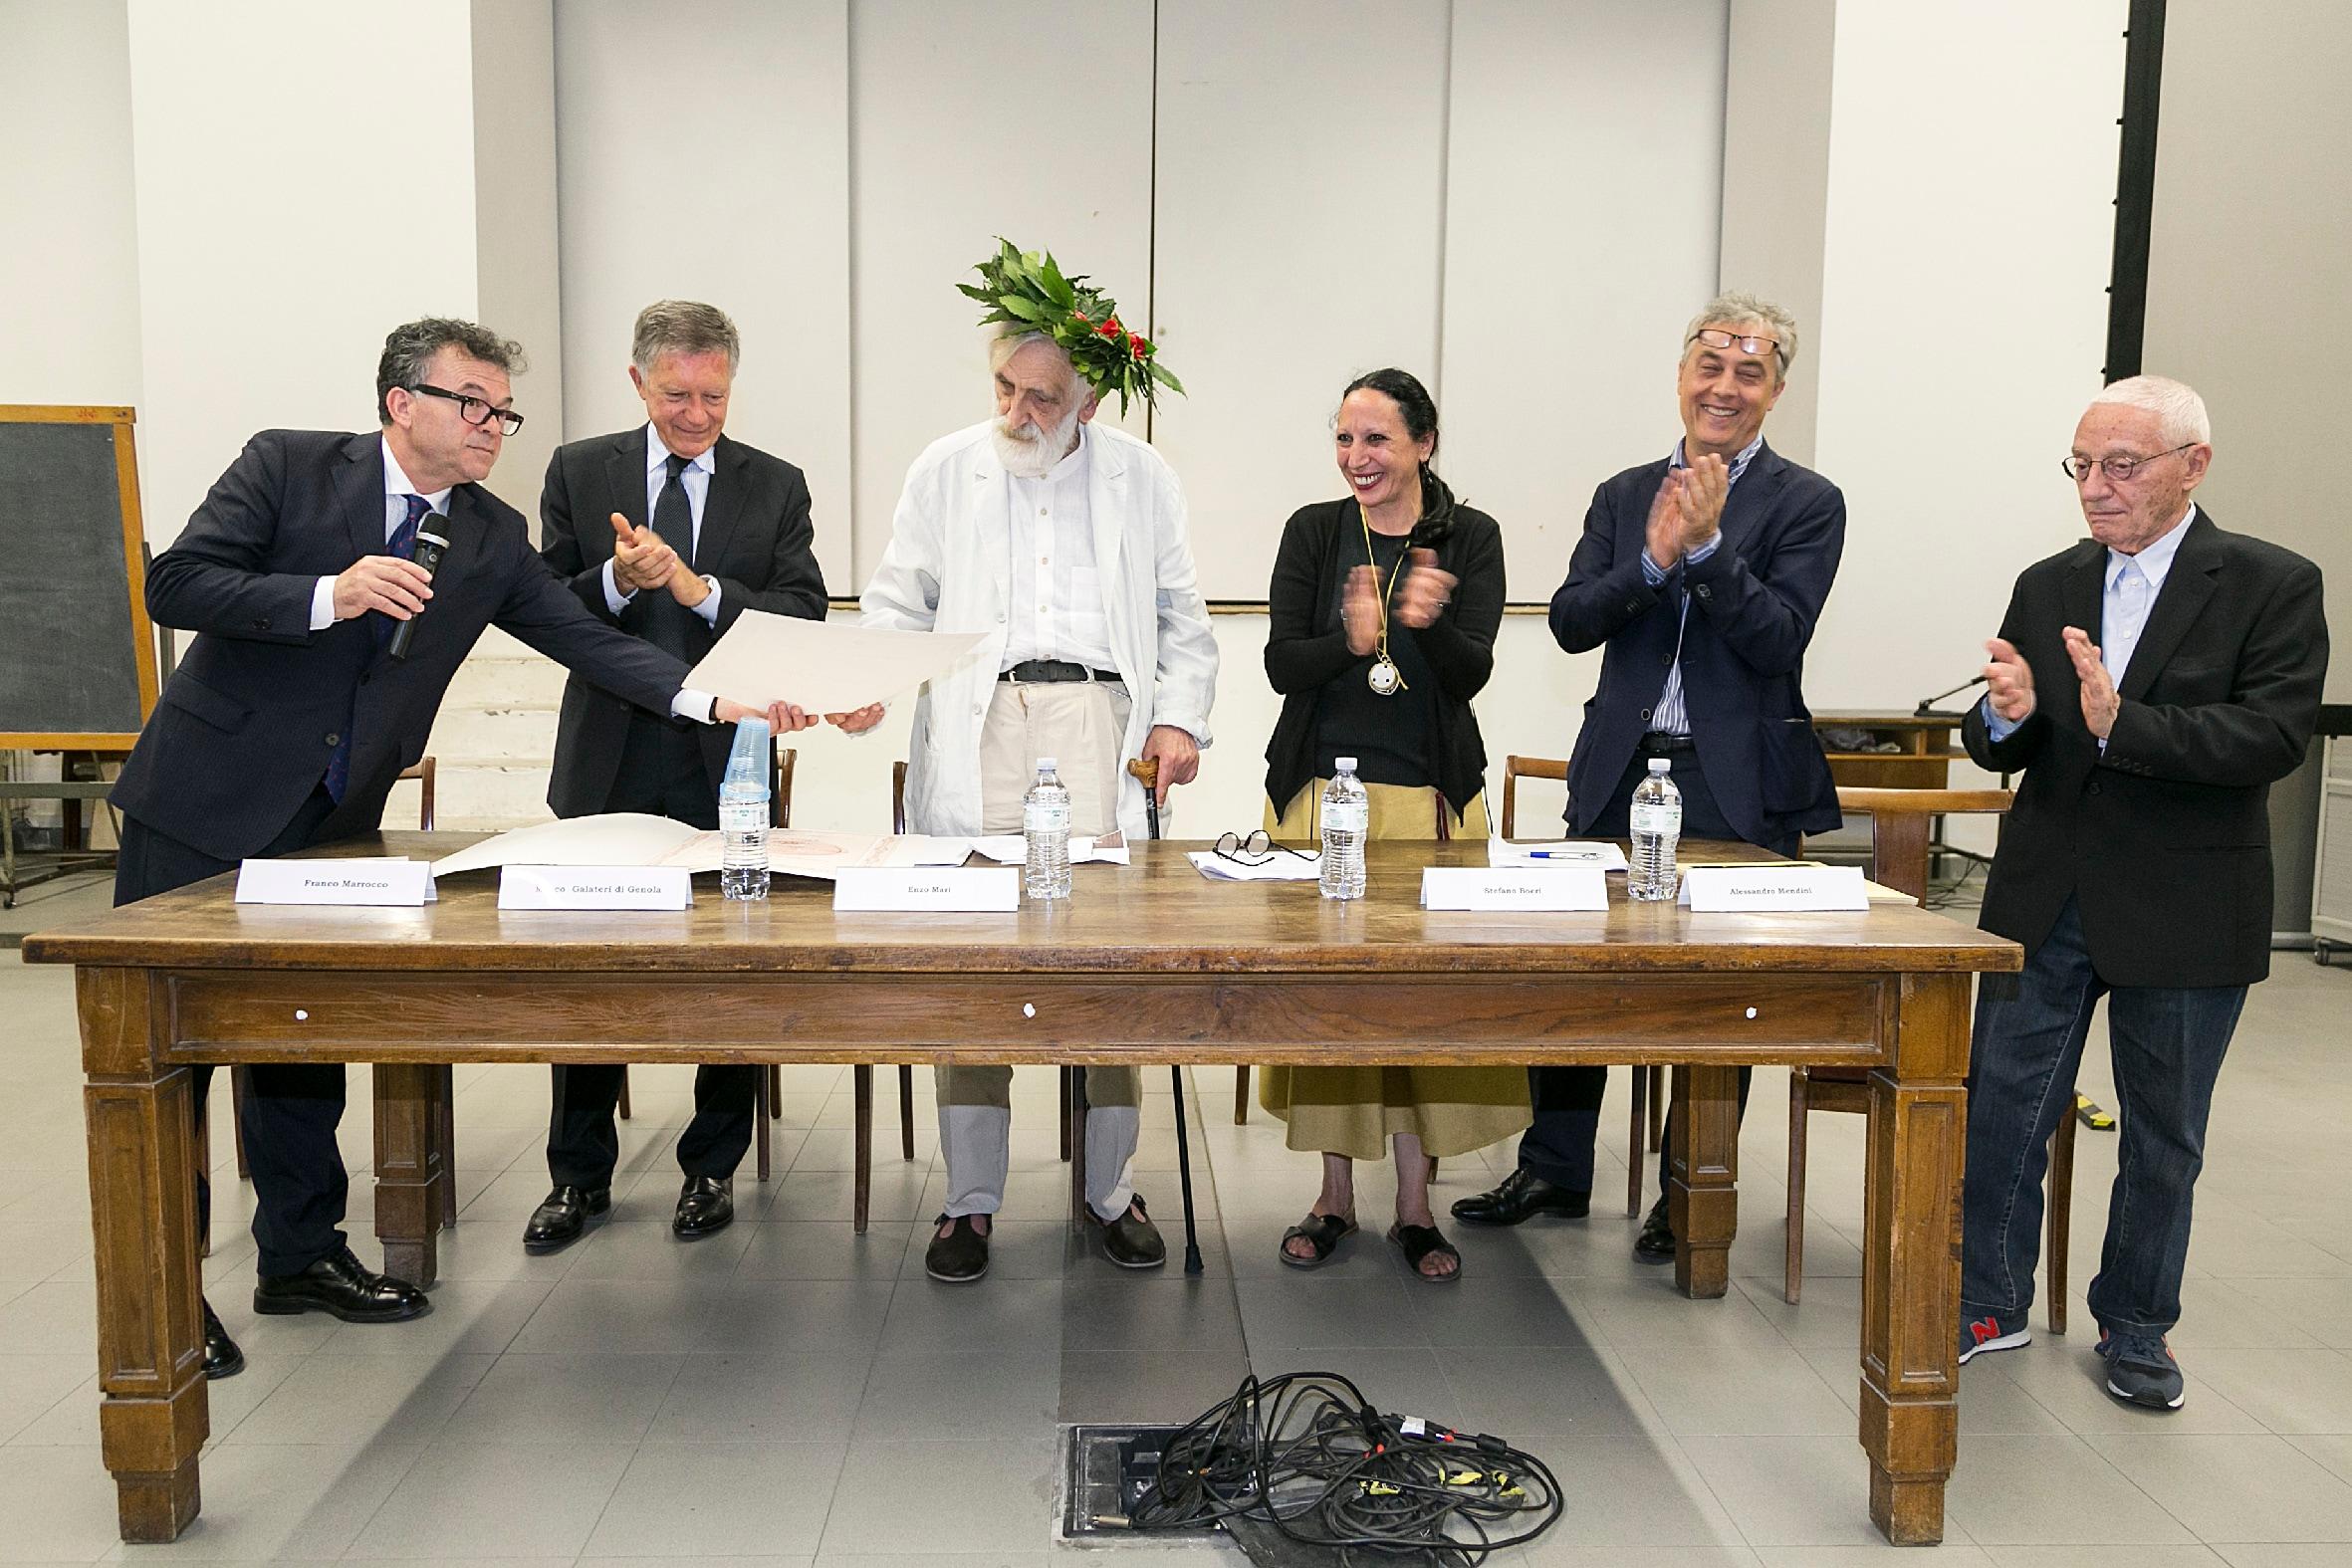 Diploma Accademico Honoris Causa ad Enzo Mari